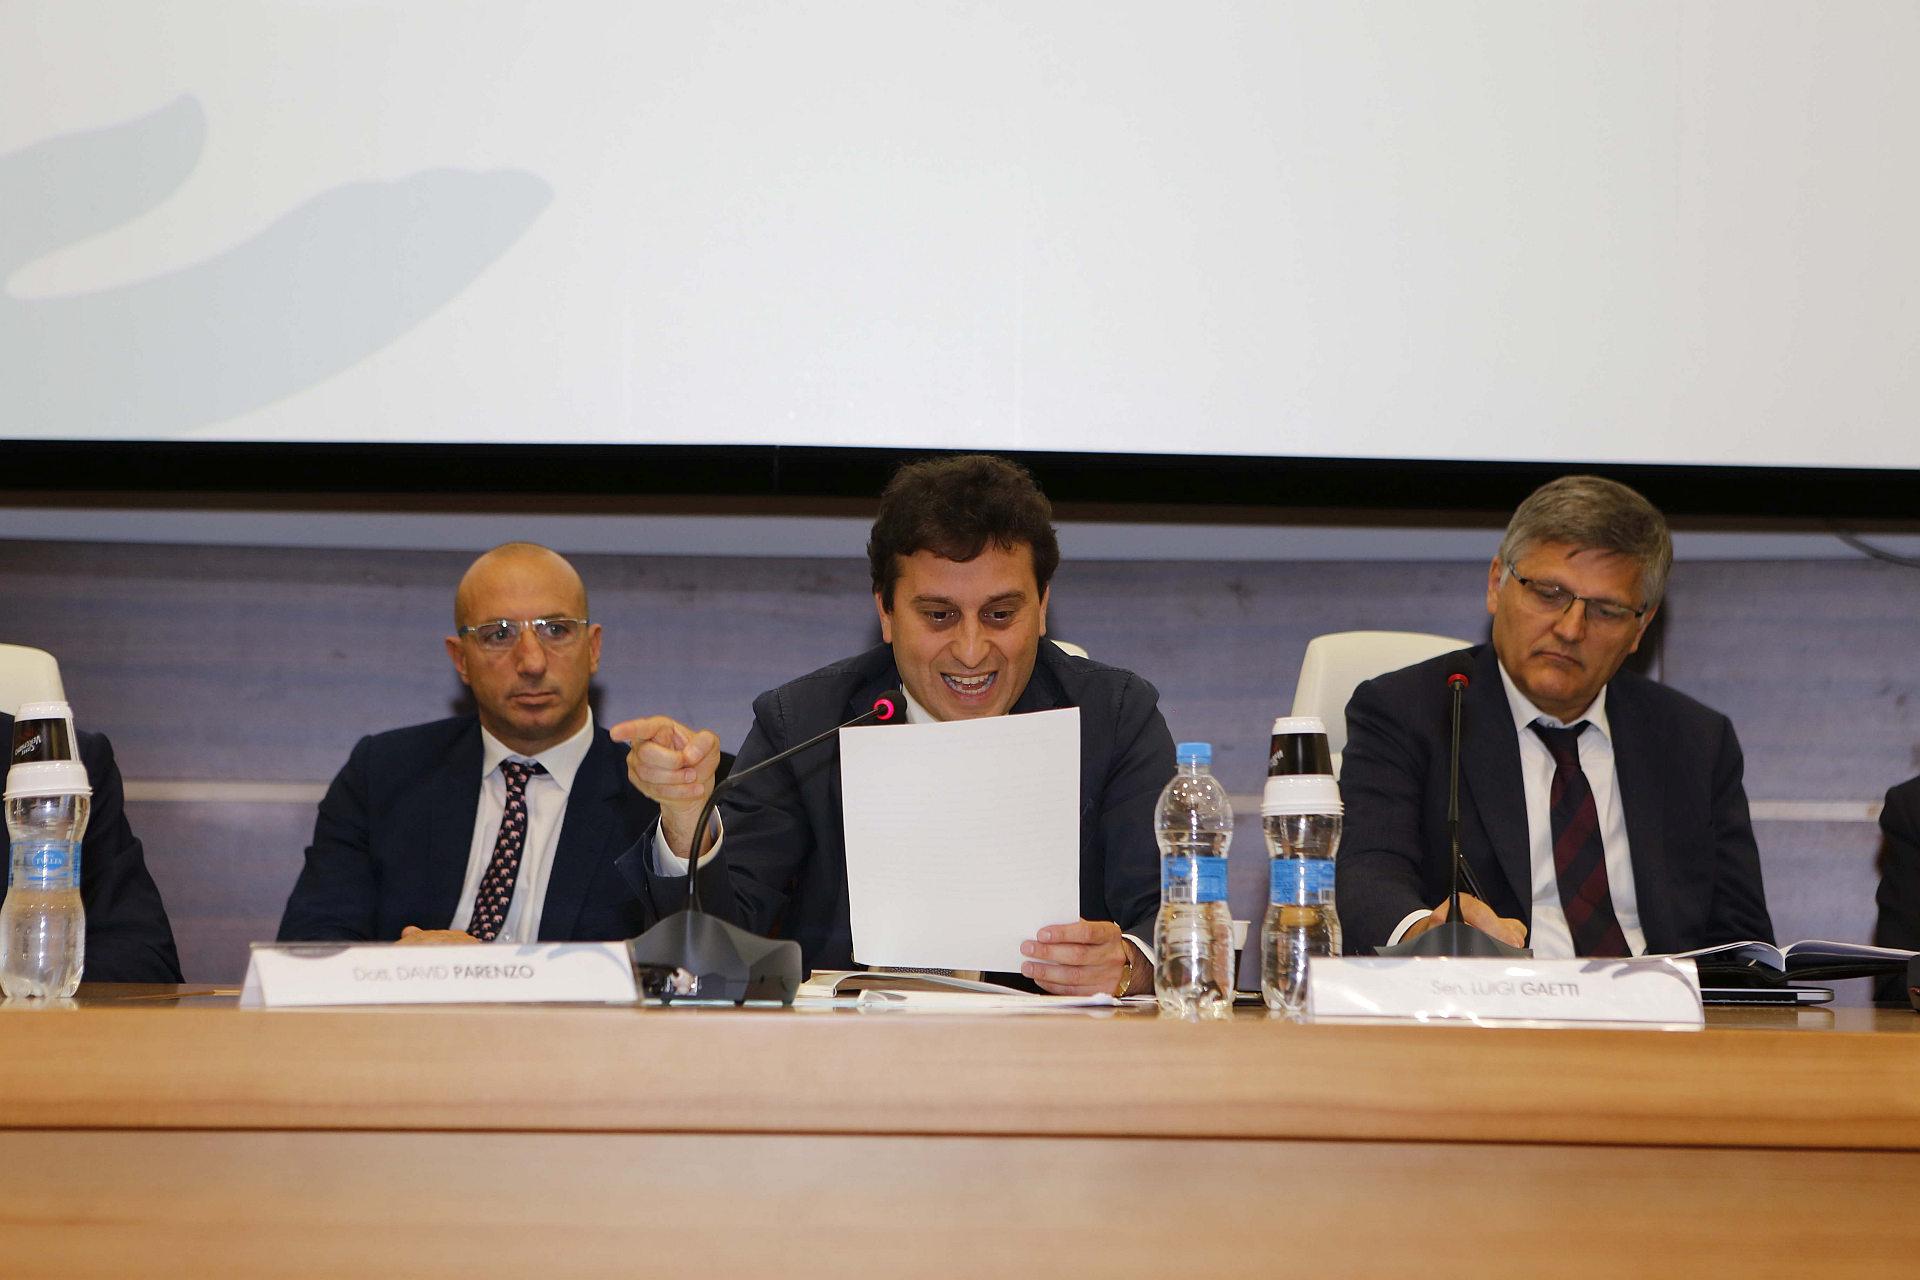 Massimo Tortorella, David Parenzo e Luigi Gaetti